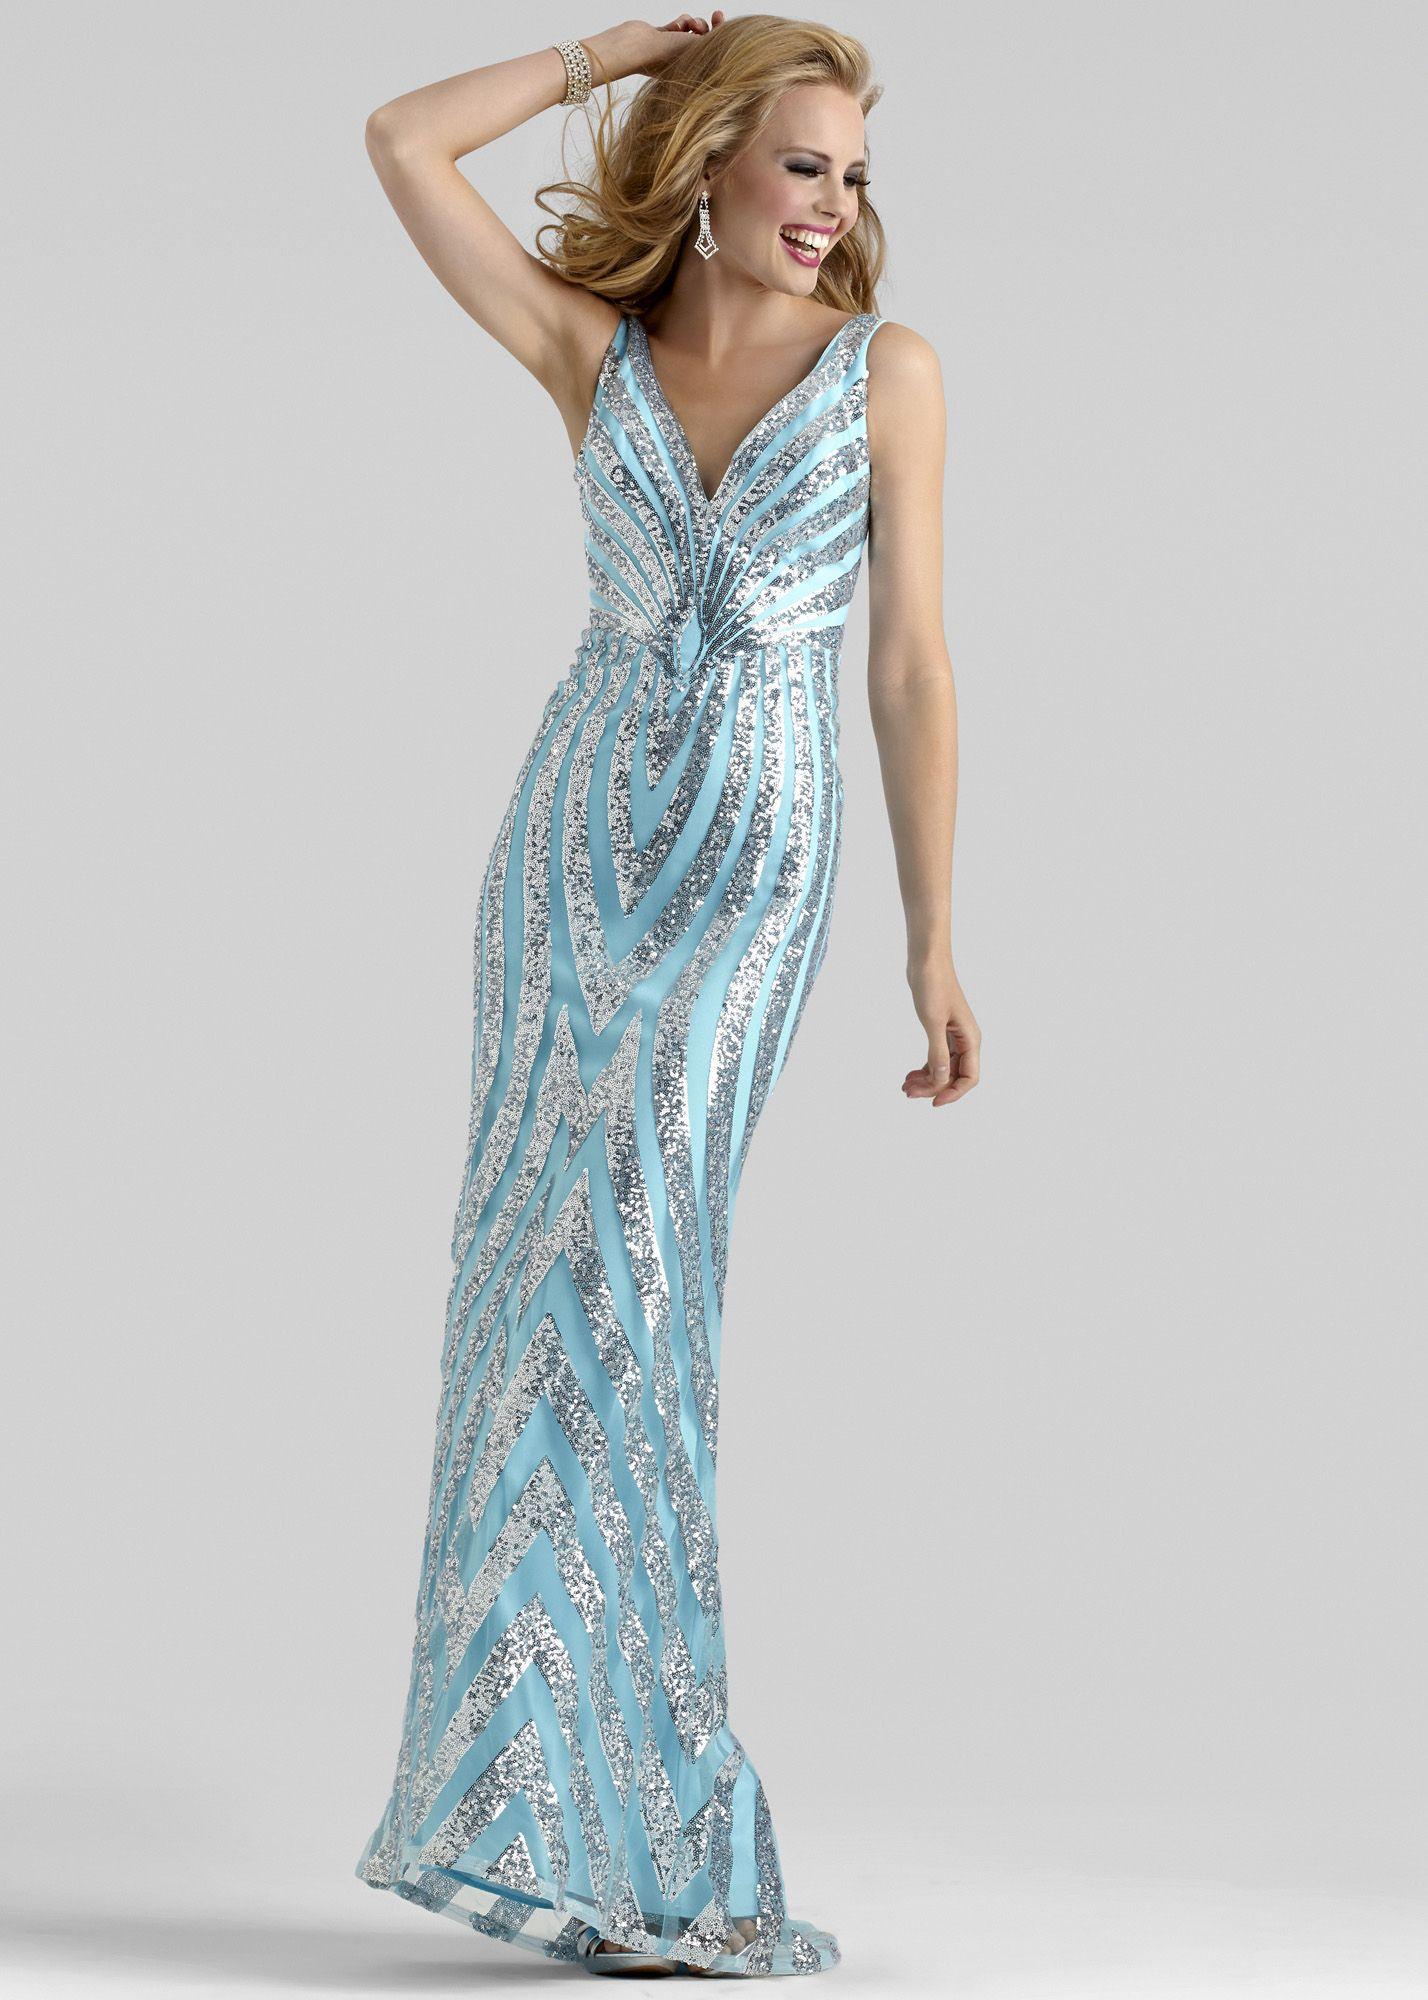 Clarisse 2325 - Blue/Silver Sequin V-Neck Prom Dresses ...